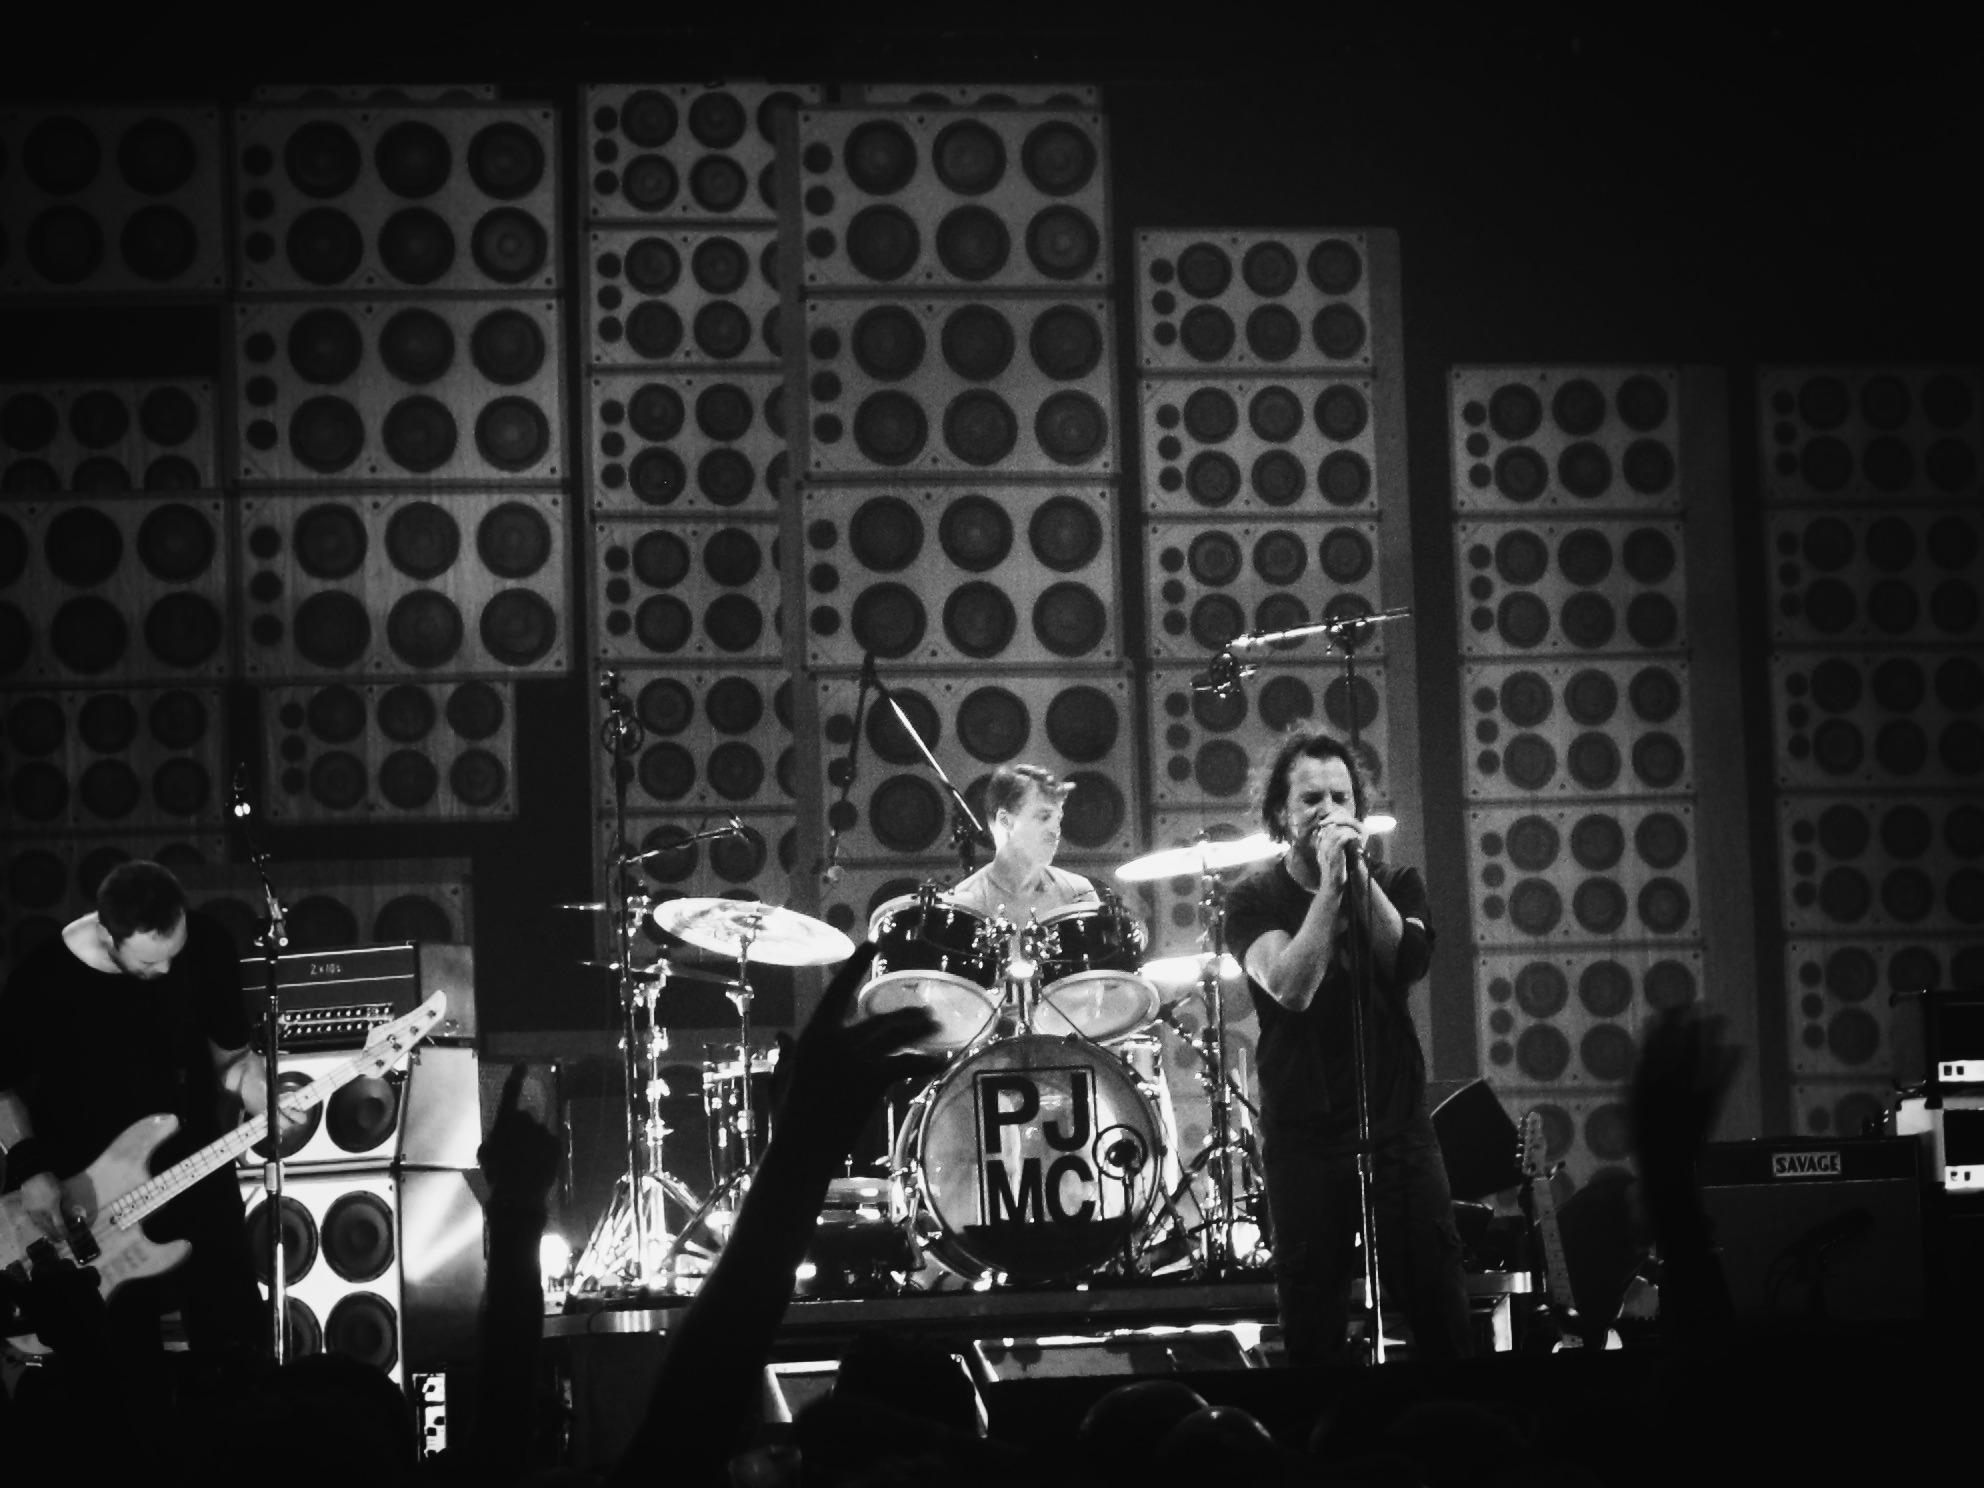 Pearl Jam, Gigaton, Grunge, Seattle, Vedder, Rock